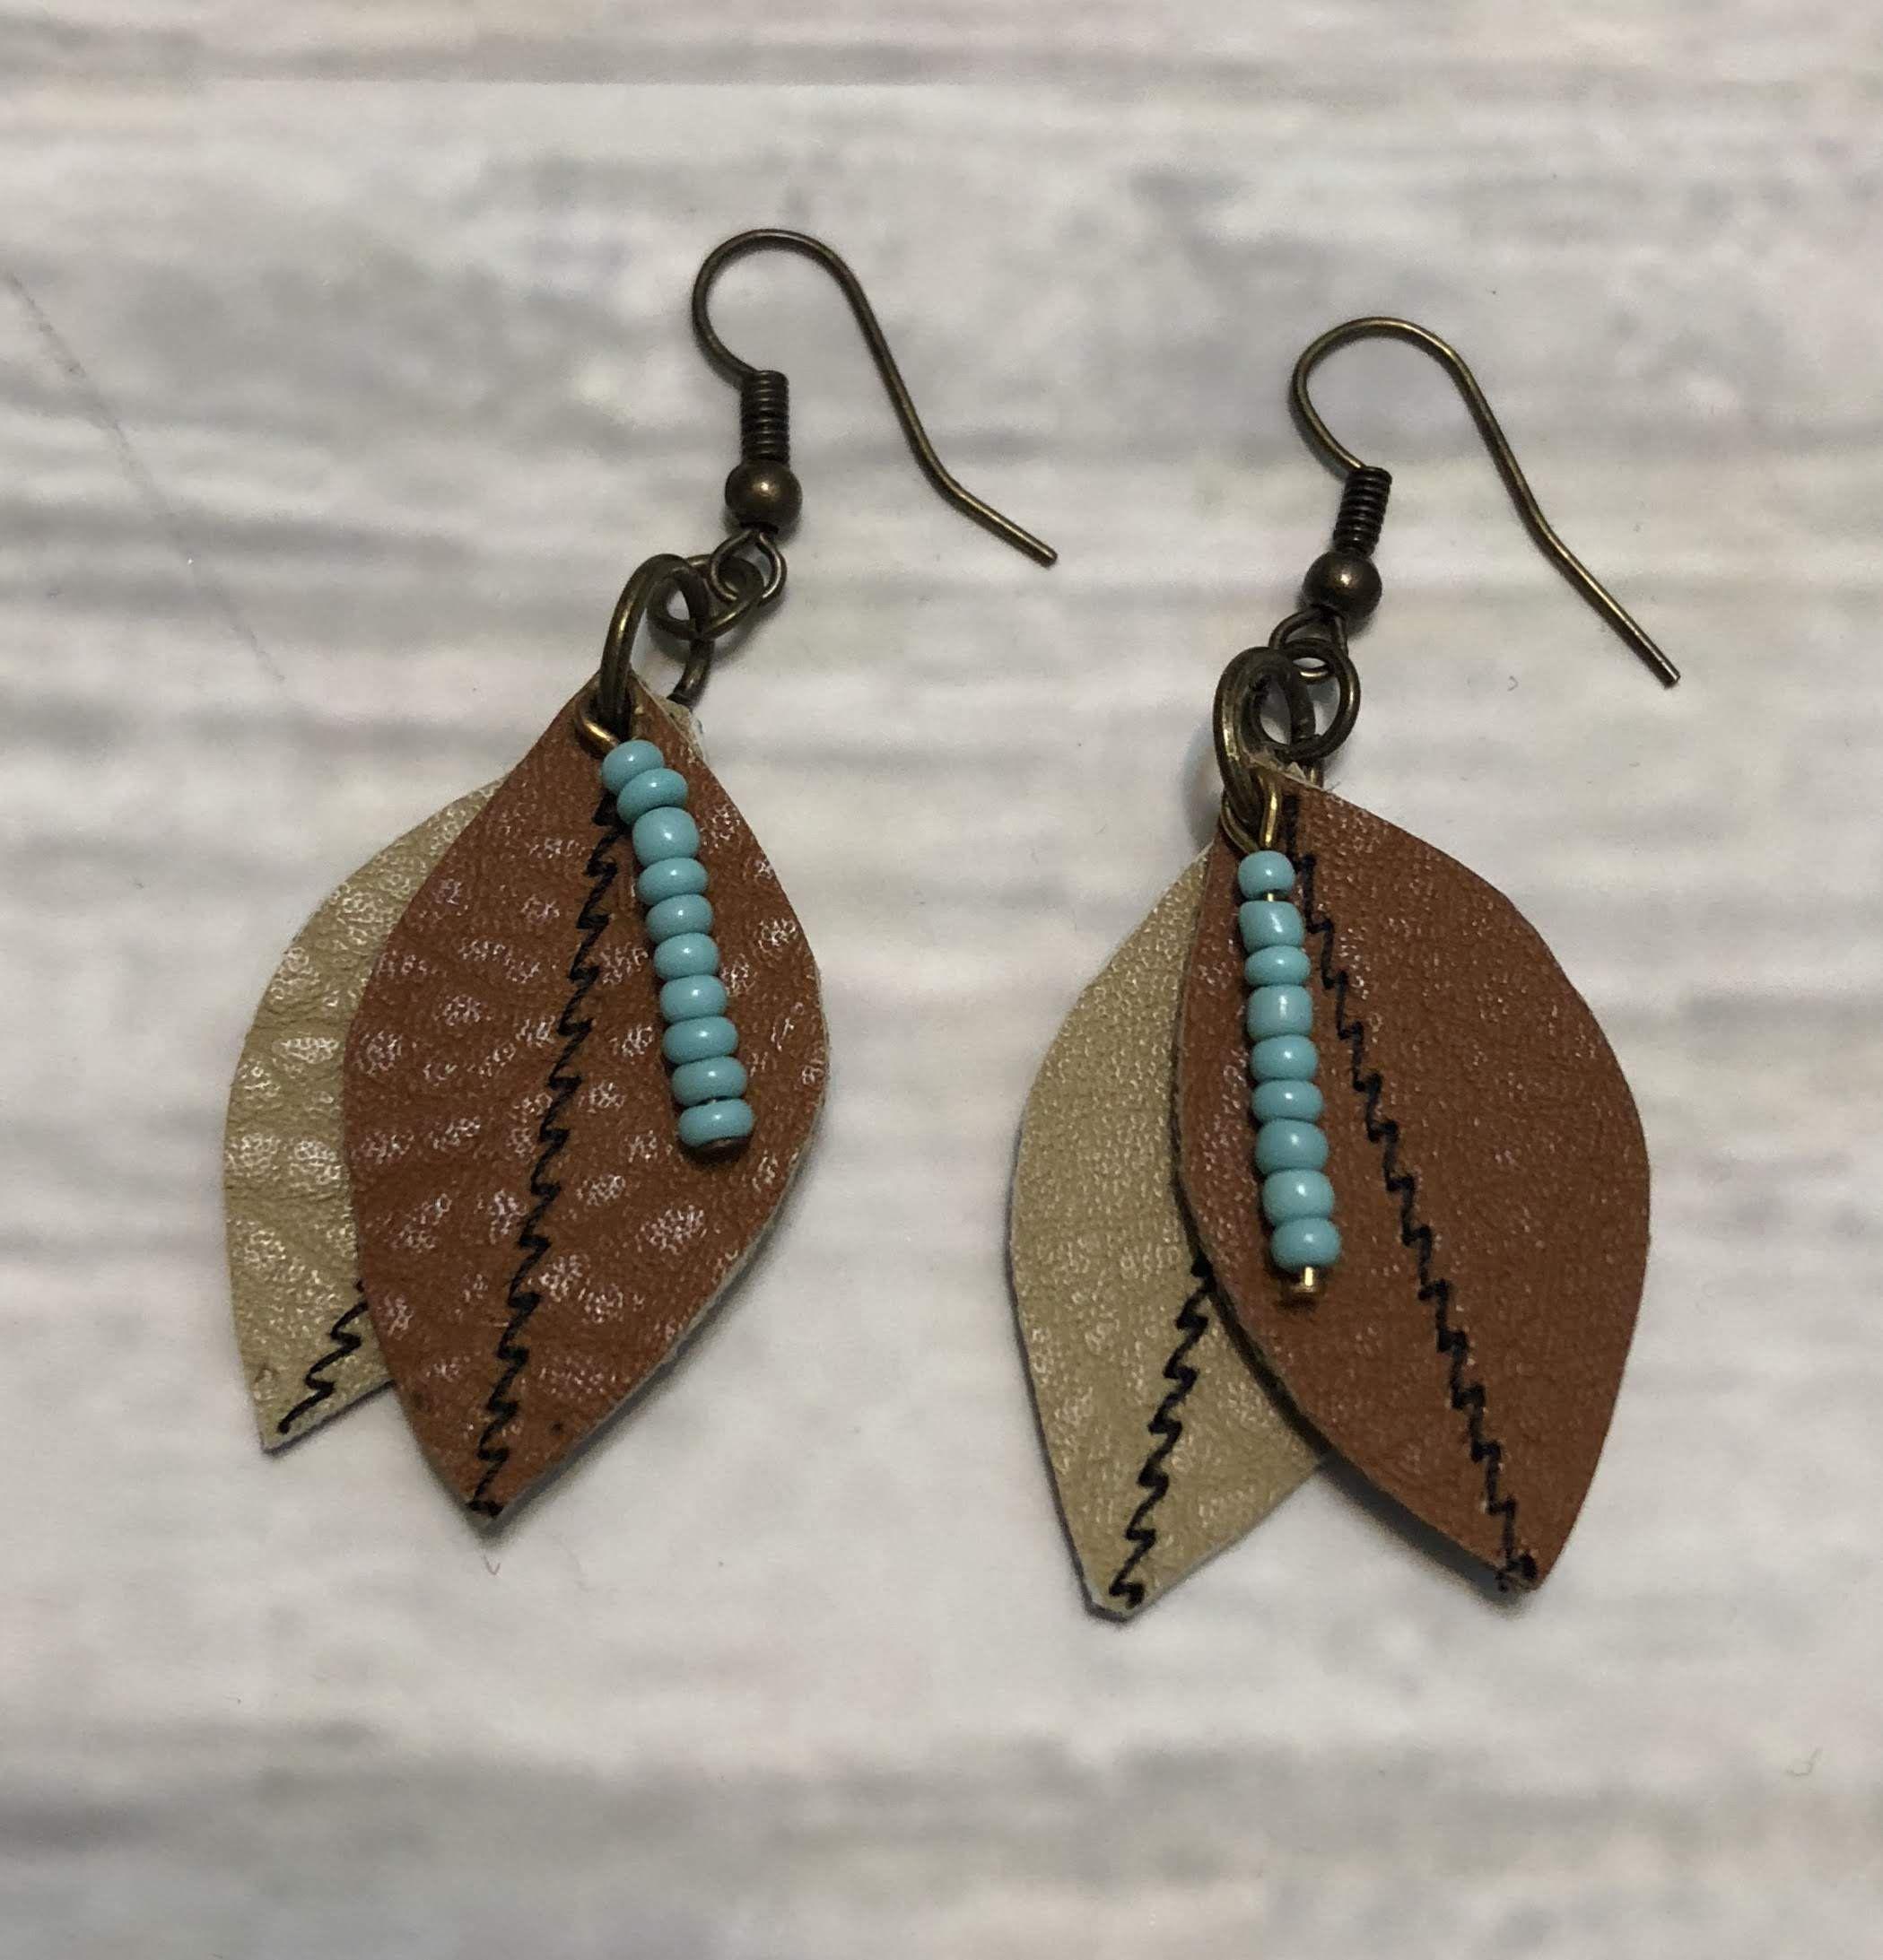 Wood and palm leaf burgundy genuine leather teardrop earrings Handmade by Got You Hooked Designs.